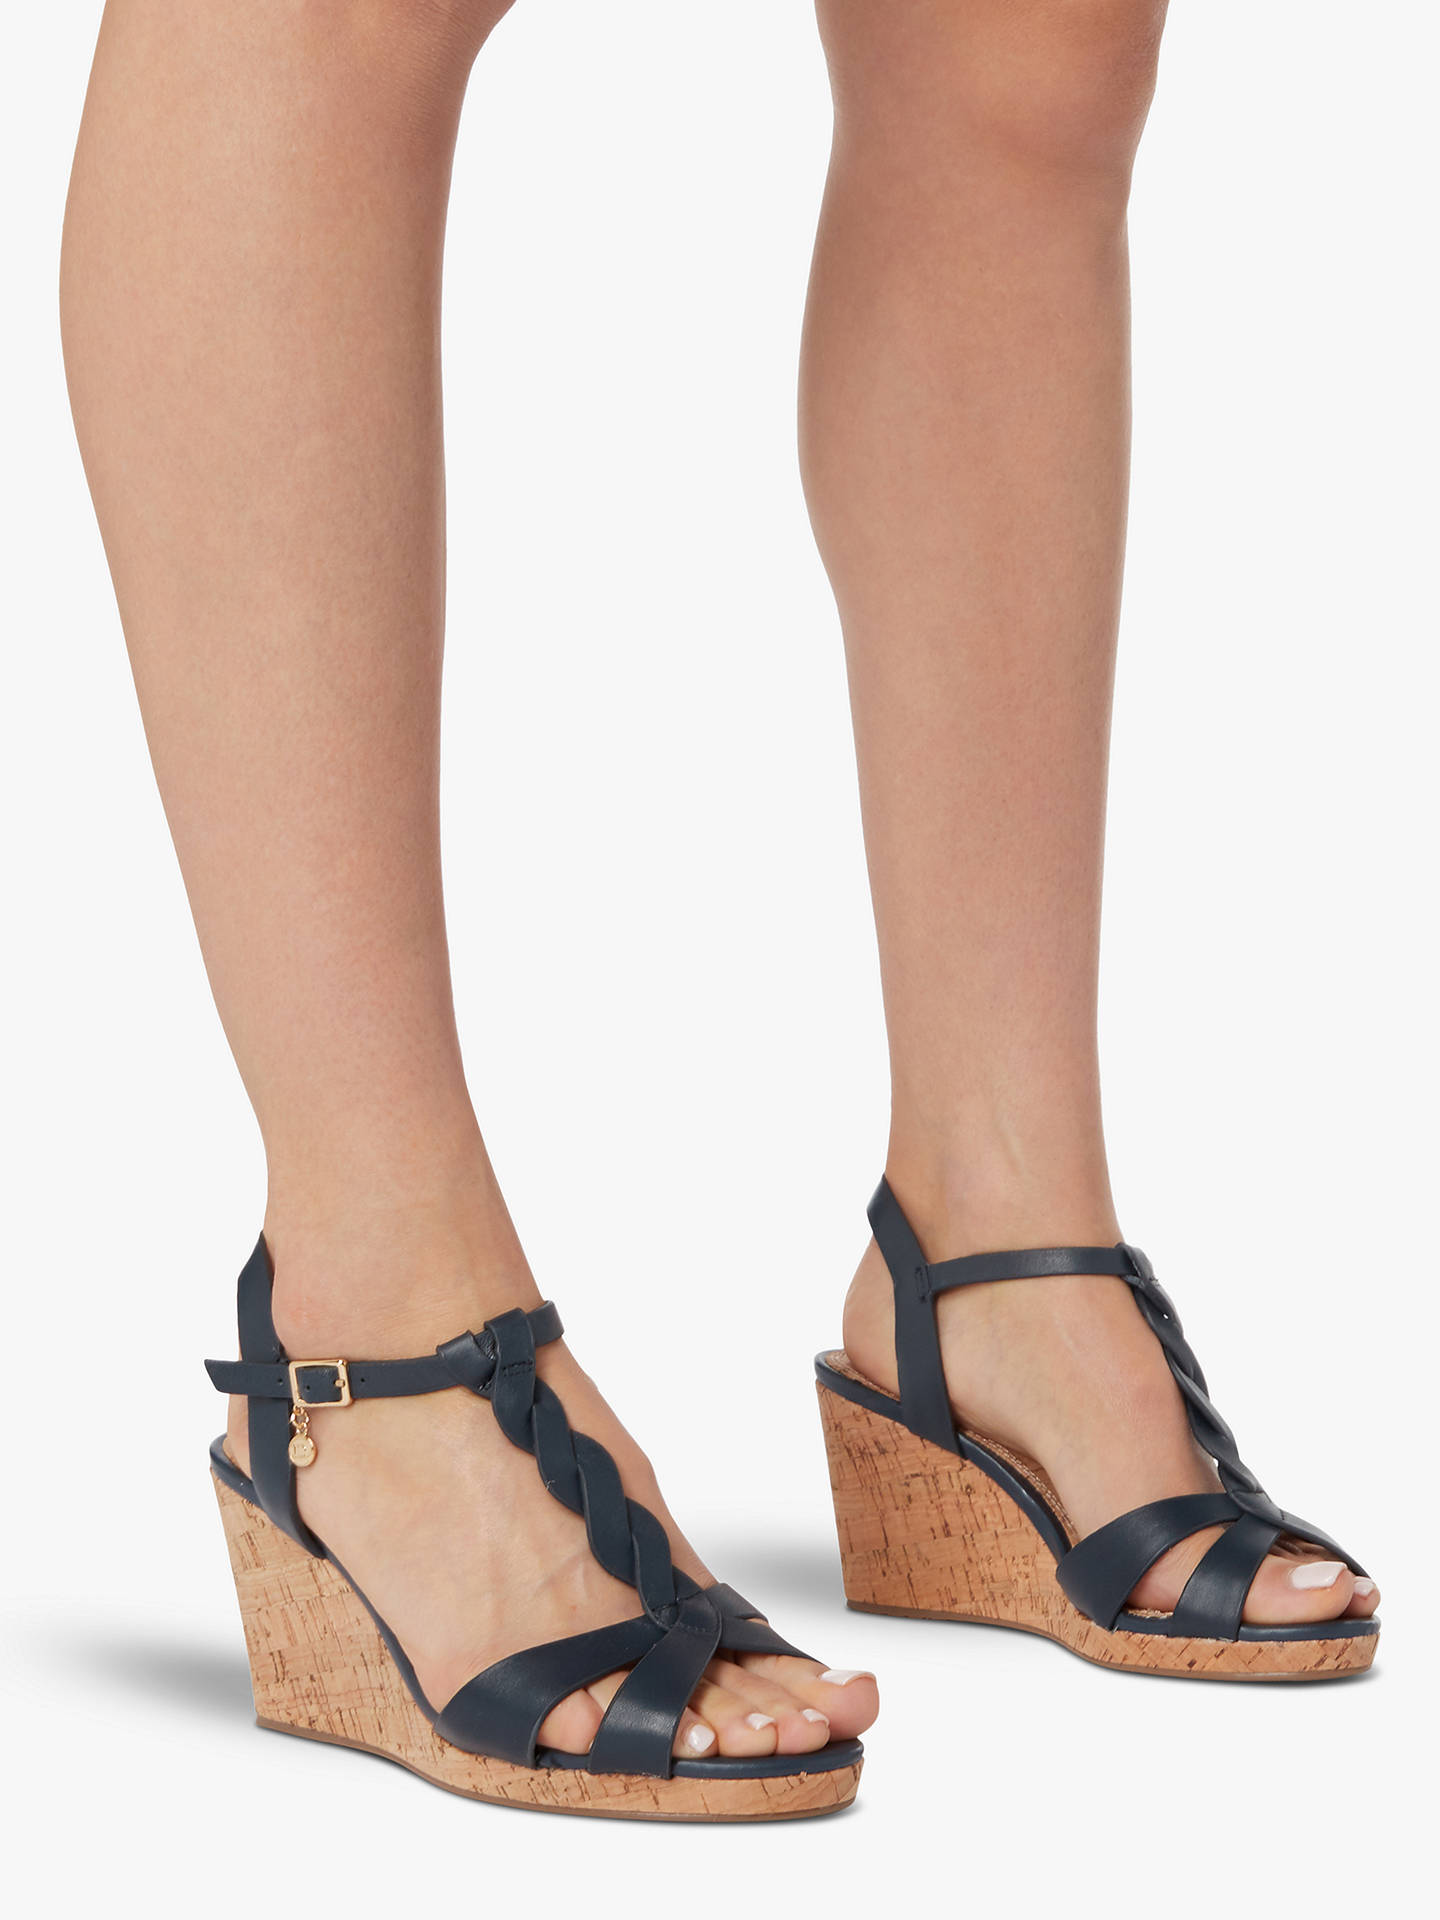 Buy Dune Wide Fit Leather Koala Wedge Heel Sandals, Navy Blue, 3 Online at johnlewis.com